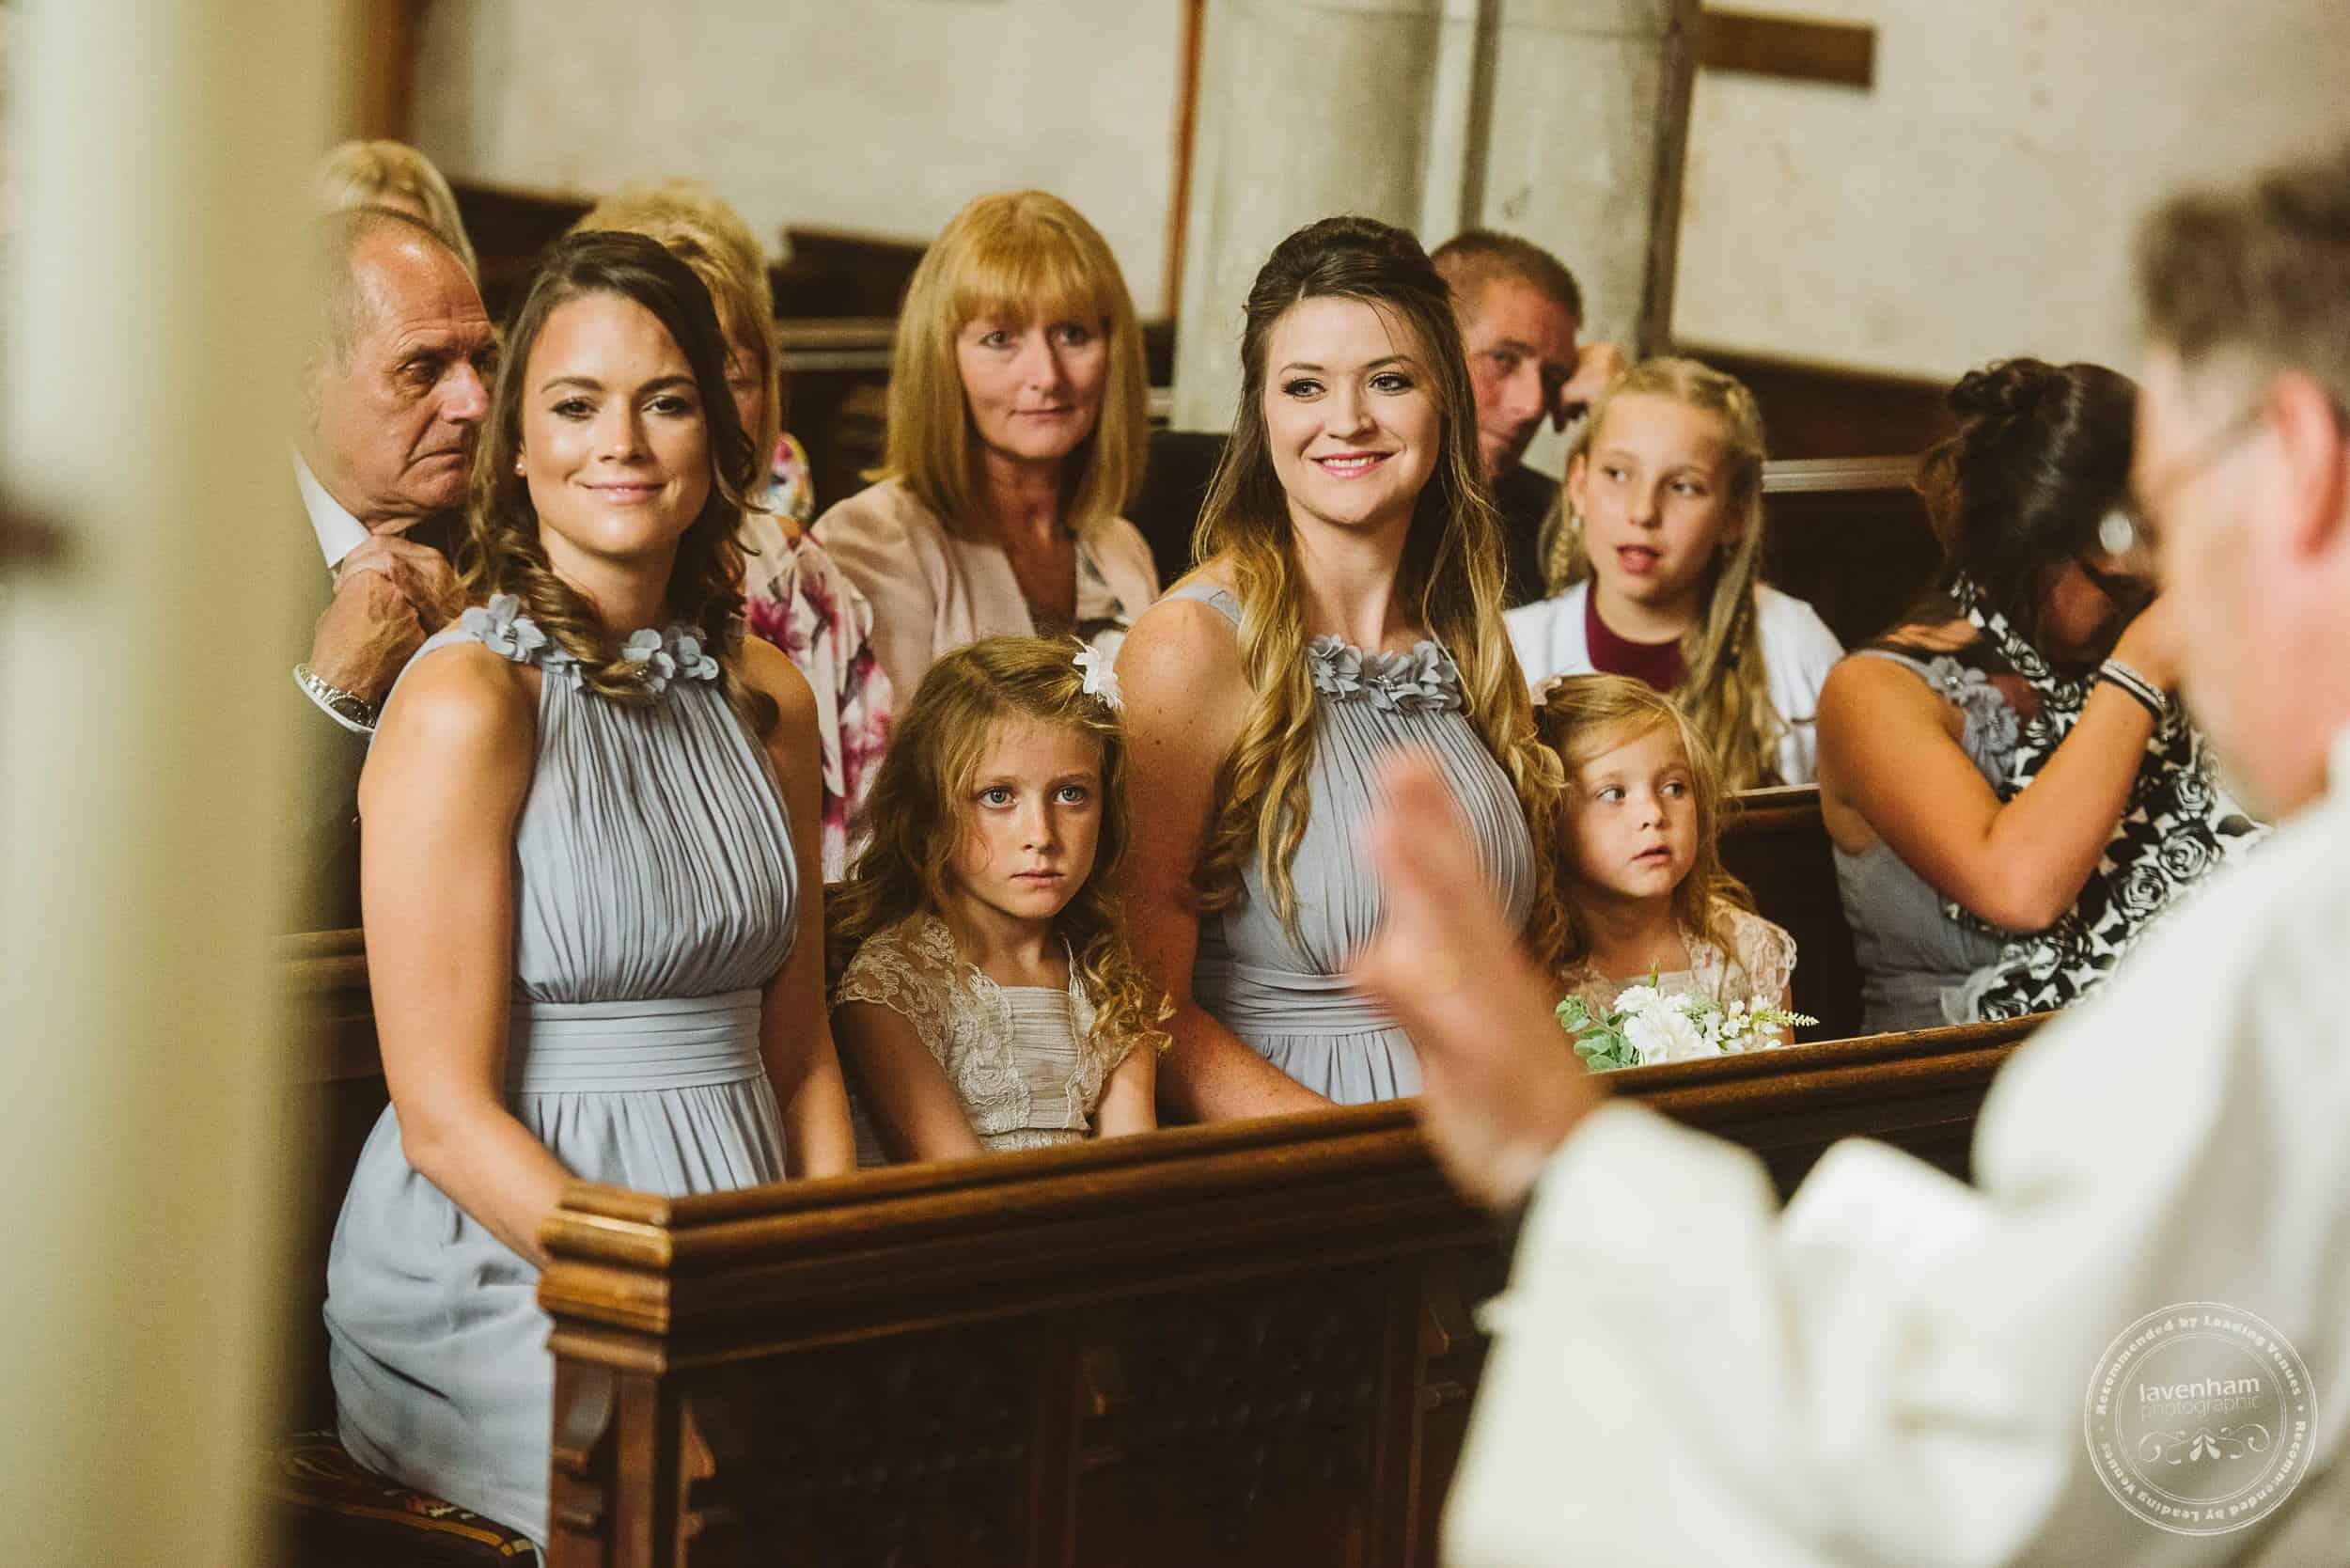 180818 Marks Hall Wedding Photography Lavenham Photographic 049